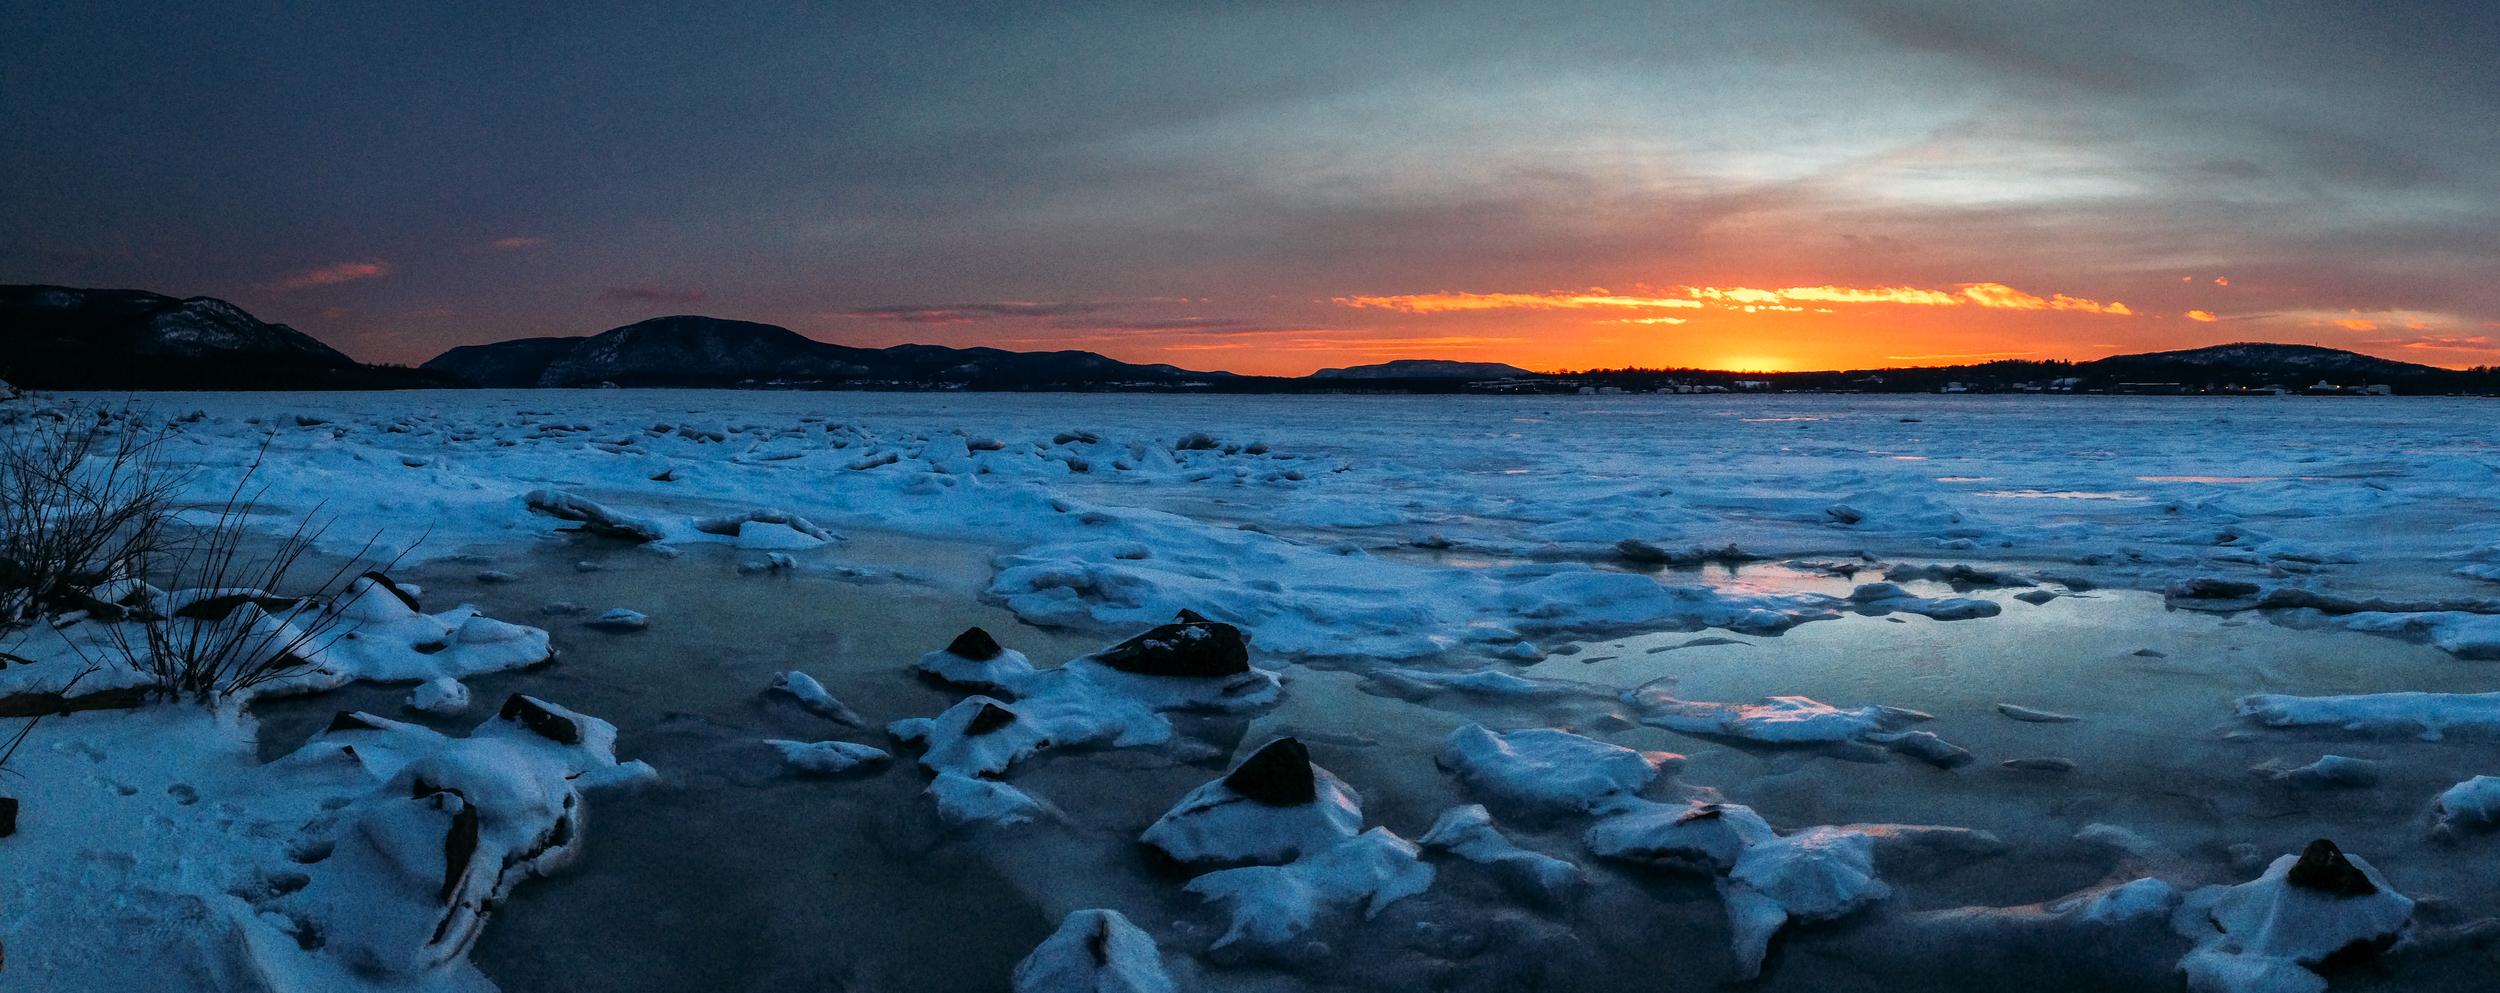 icydenningspointsunet_ Winter 2015-1.jpg